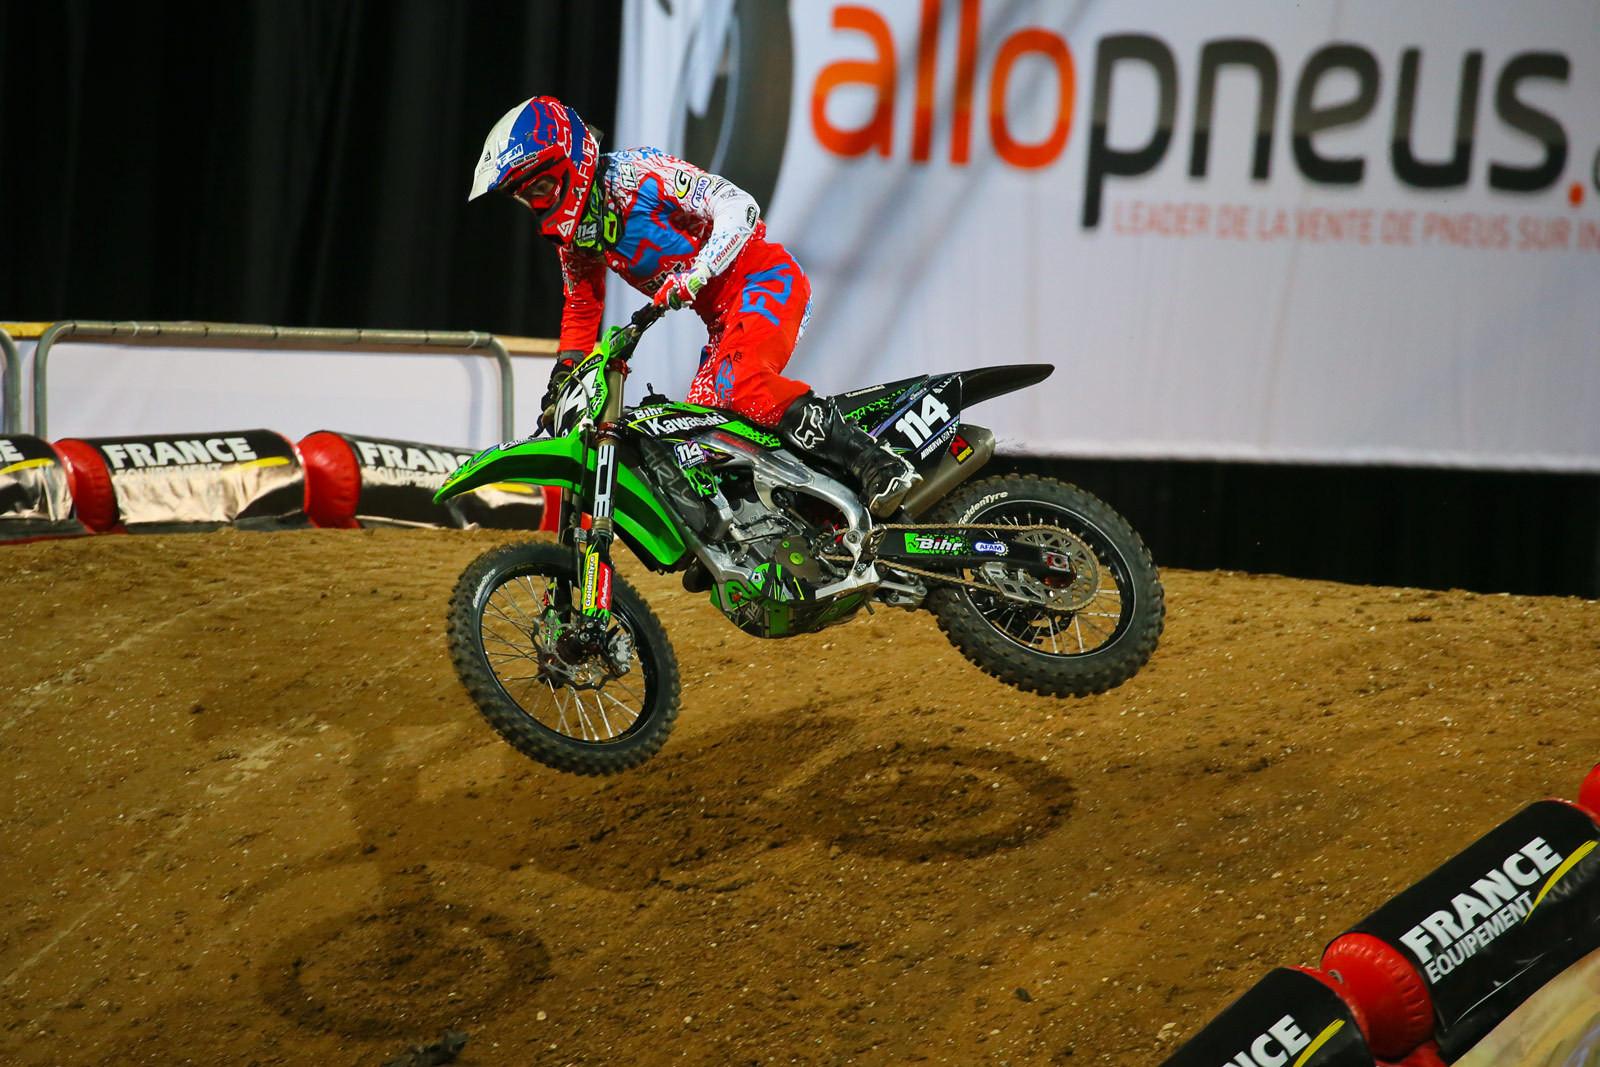 Livia Lancelot - Supercross Paris-Lille: Press Day - Motocross Pictures - Vital MX